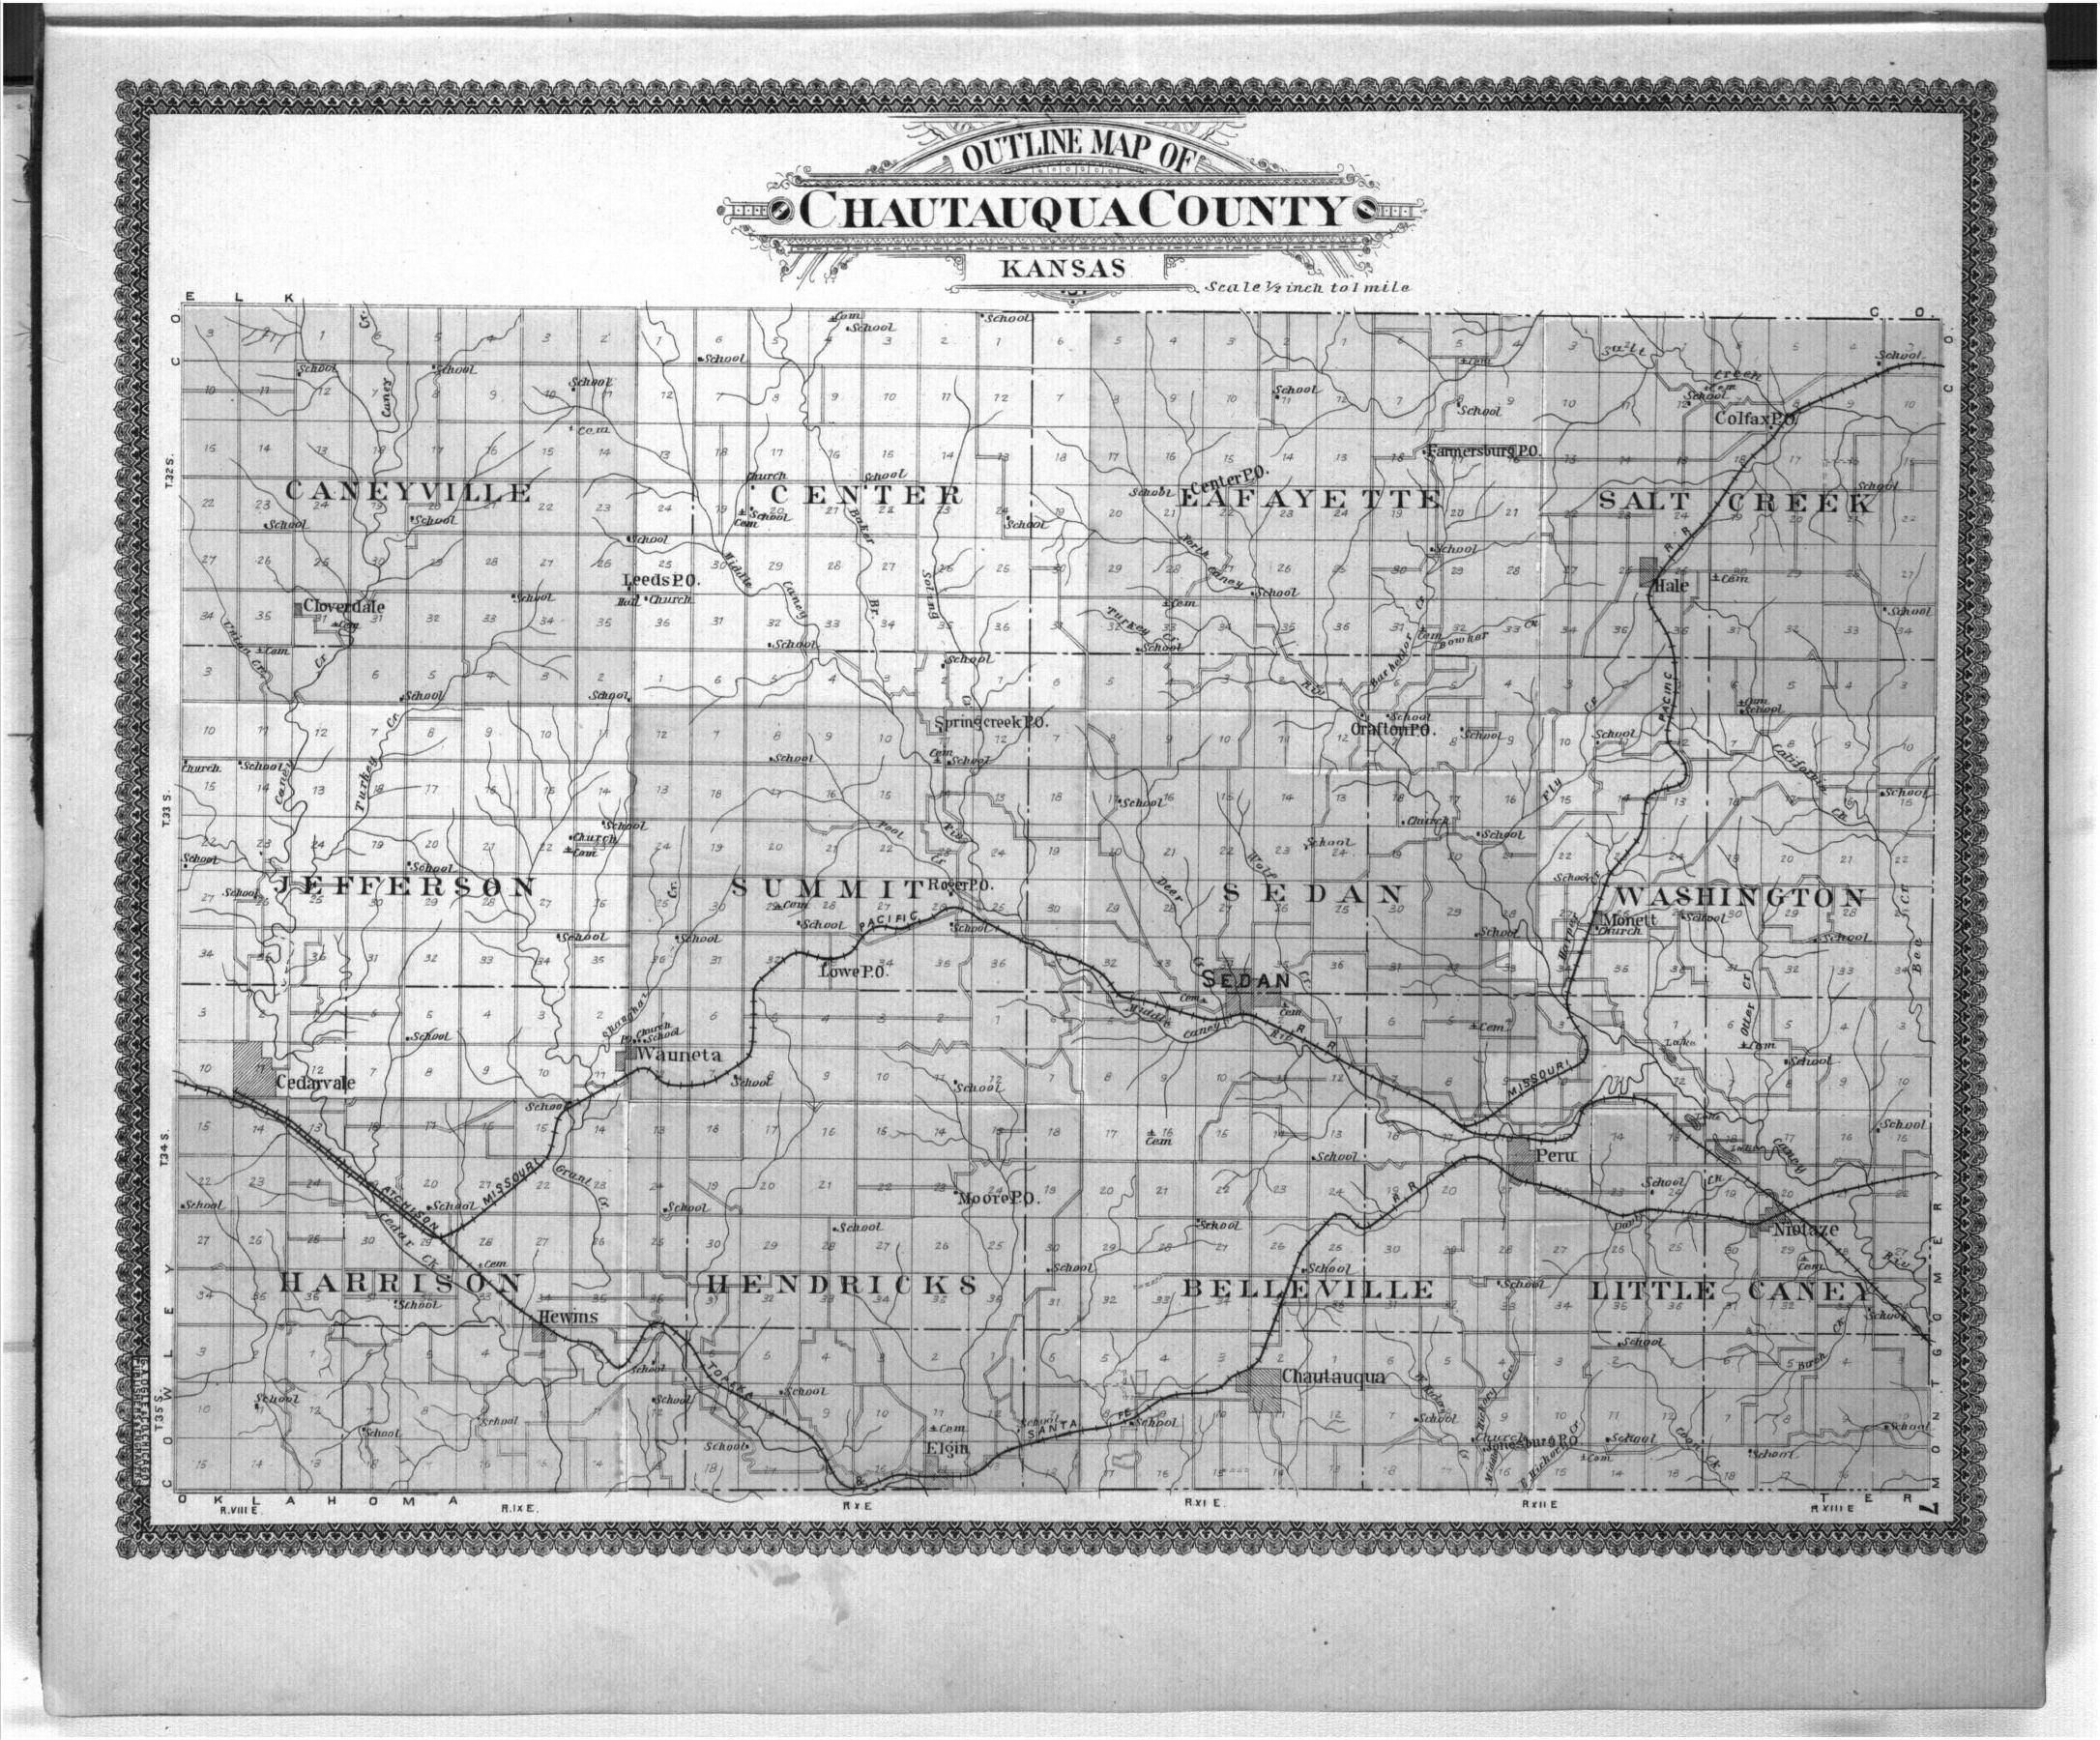 Standard atlas of Chautauqua County, Kansas - 7